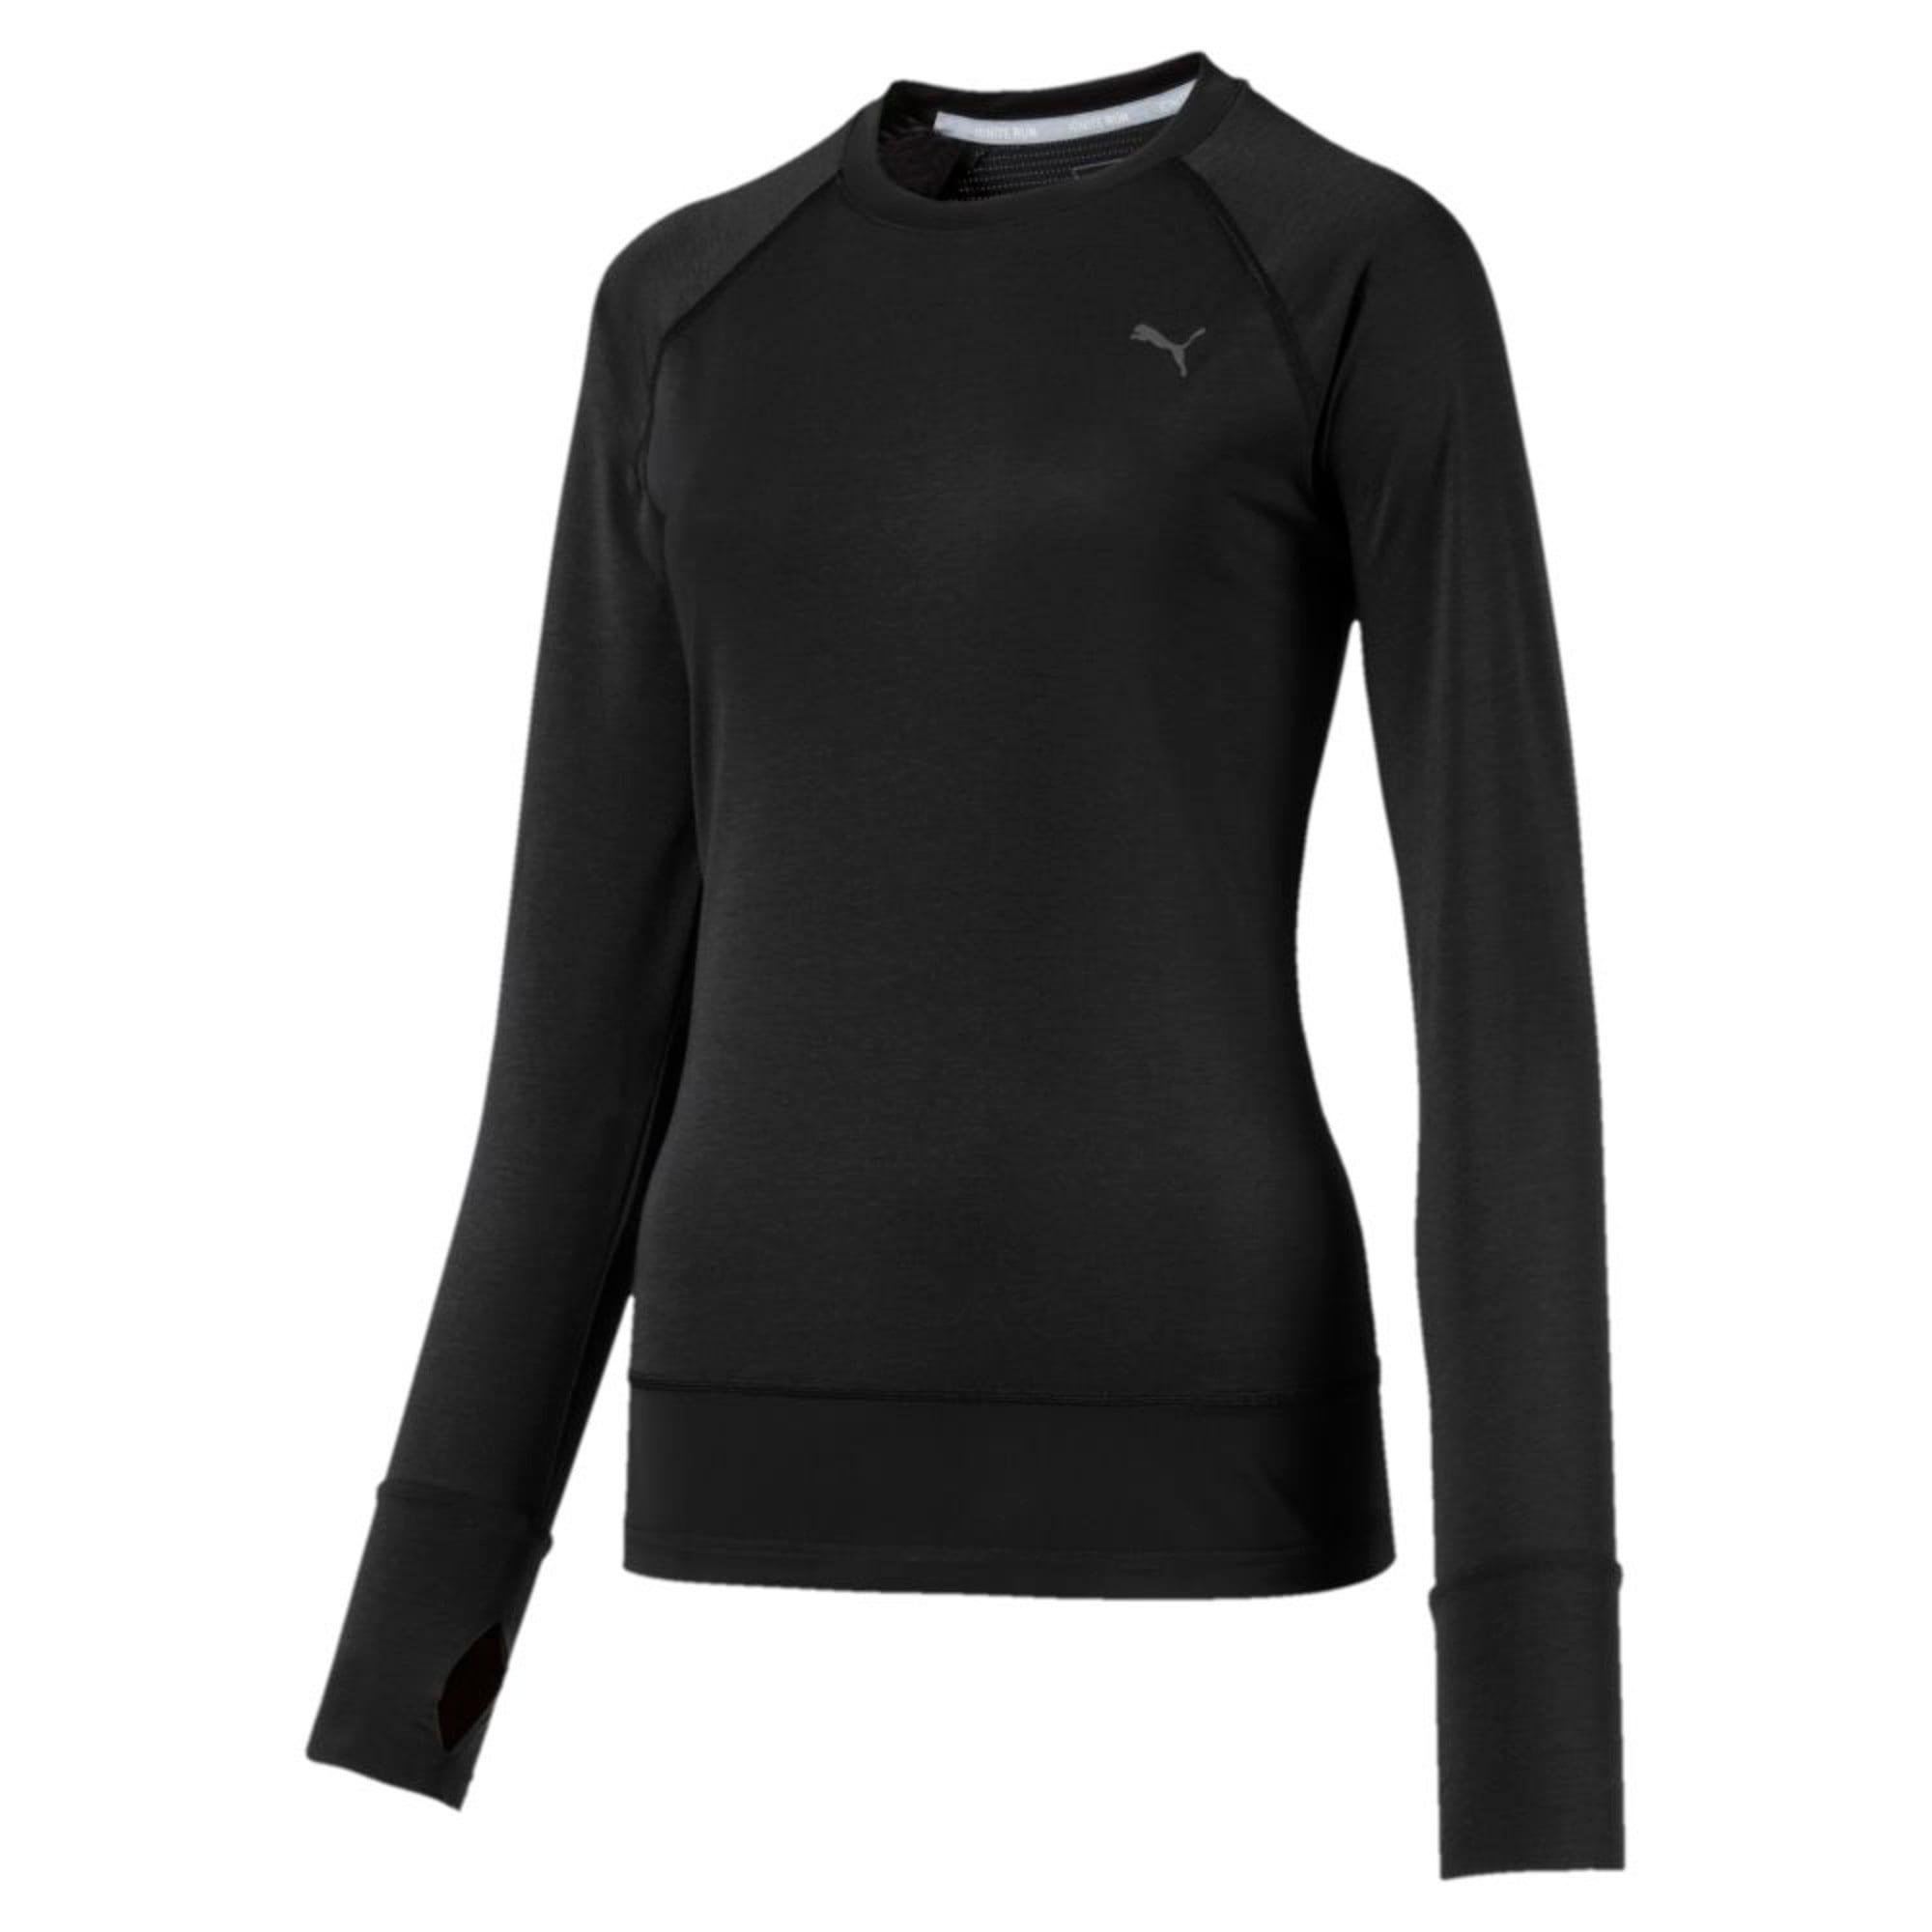 Thumbnail 5 of Winter Long Sleeve Women's Training Top, Puma Black, medium-IND